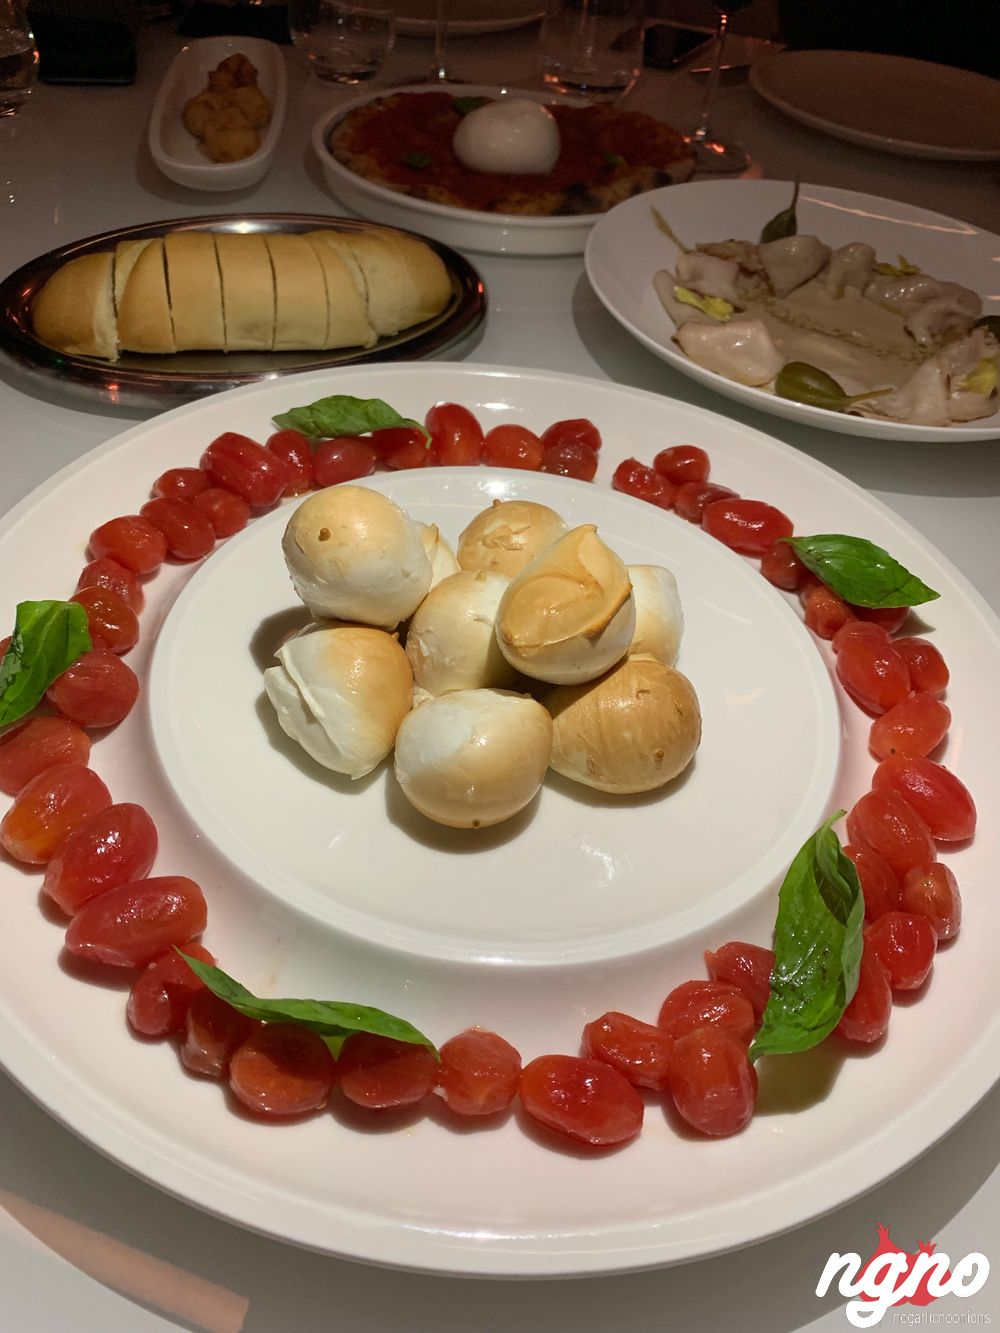 nolita-italian-restaurant-paris-nogarlicnoonions-782018-12-24-10-45-05